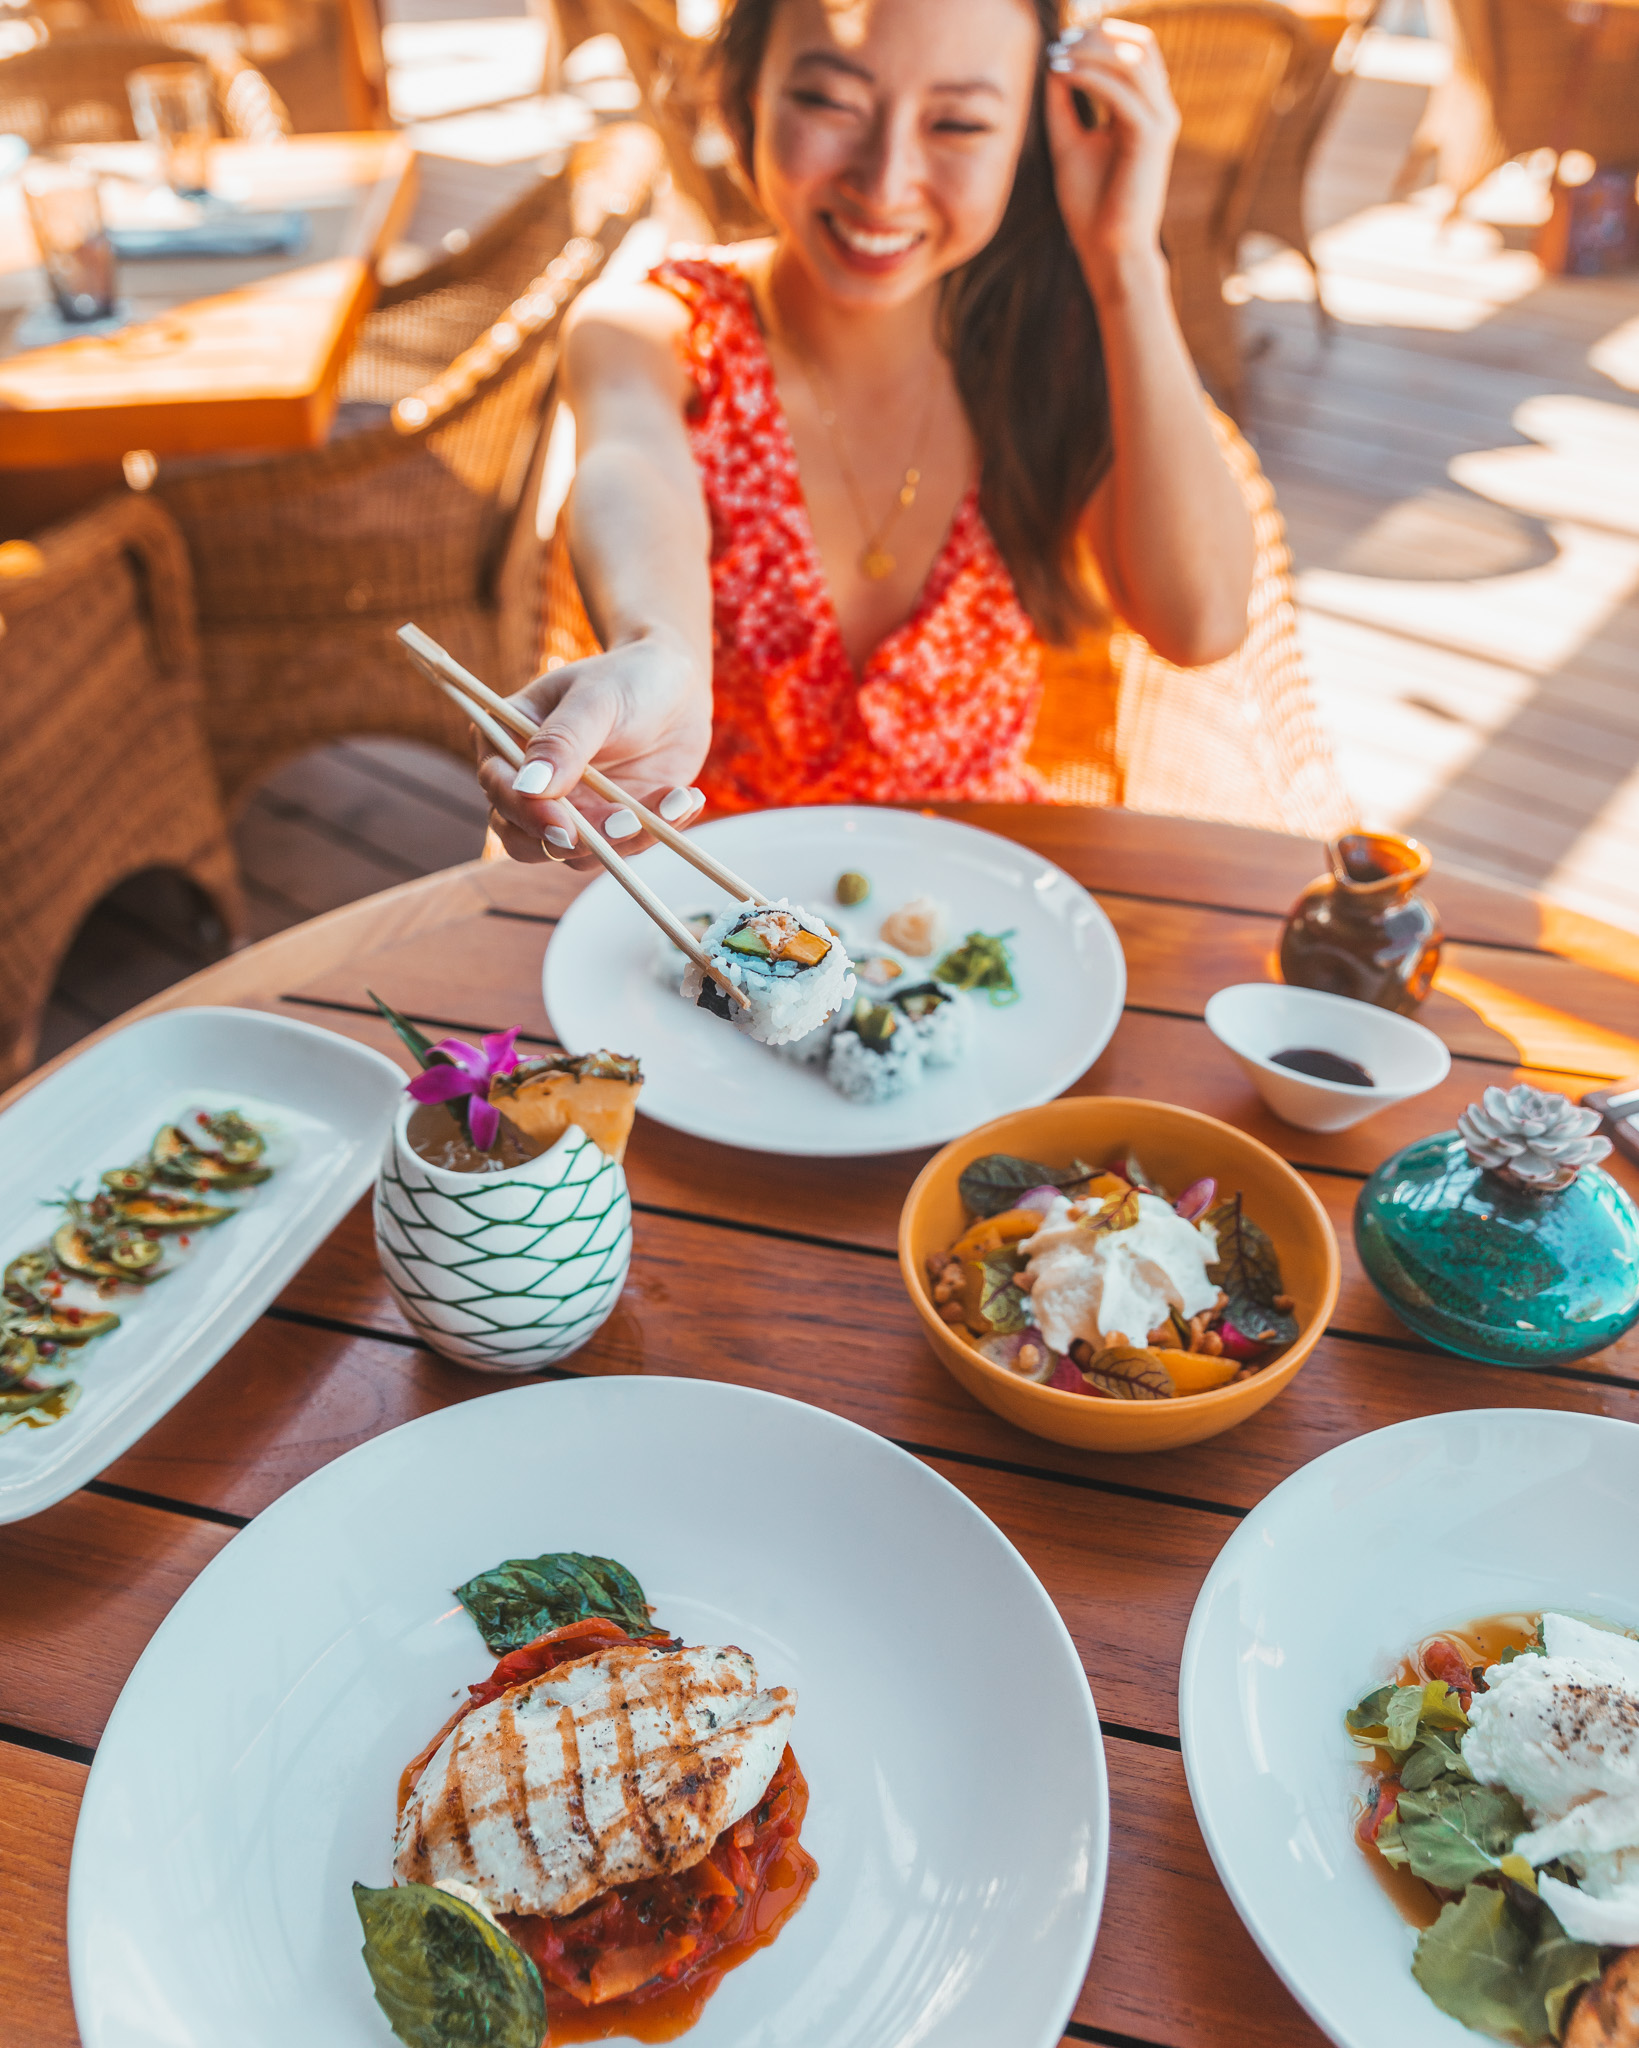 Lunch at Beach Tree Restaurant // A Luxury Stay on the Big Island: Four Seasons Resort Hualalai // #readysetjetset #hawaii #bigisland #luxuryhotels #beachresorts #usa #travel